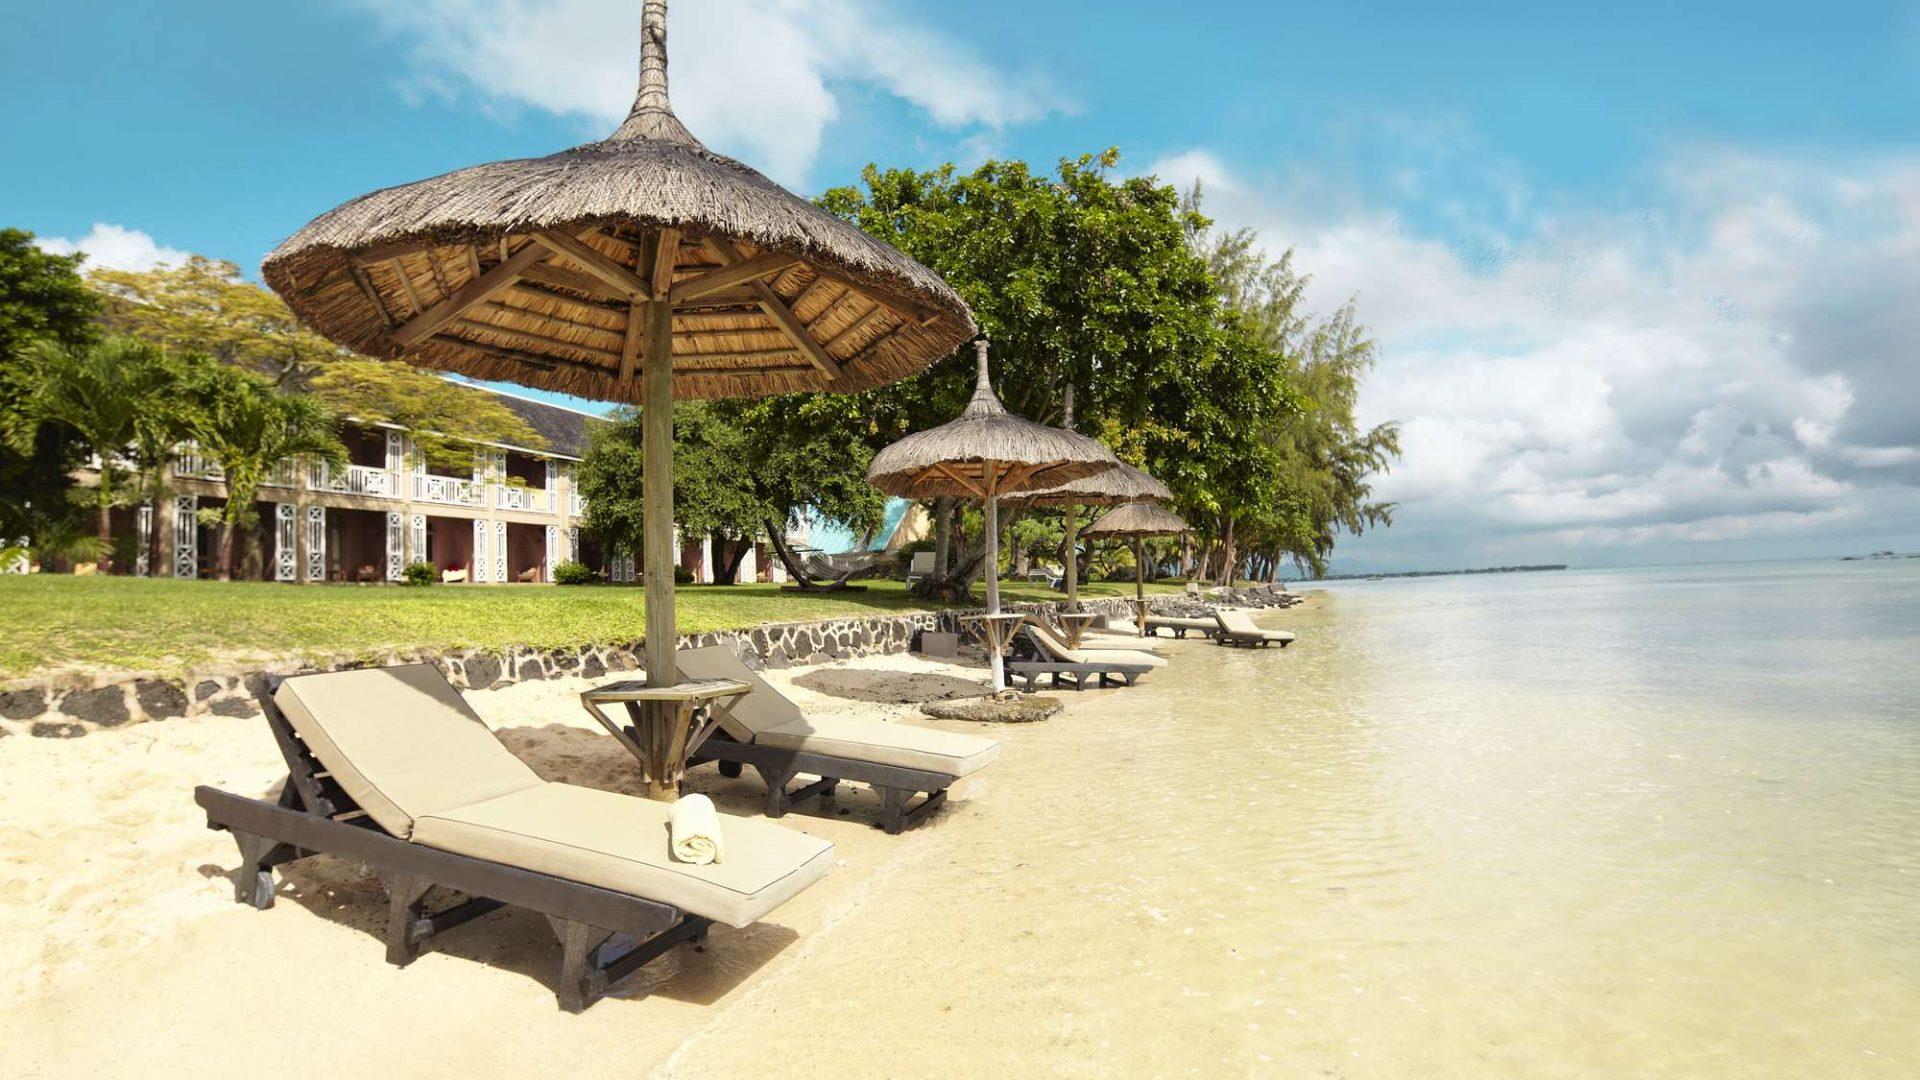 Clubmed La Pointe aux Canonniers, Mauritius